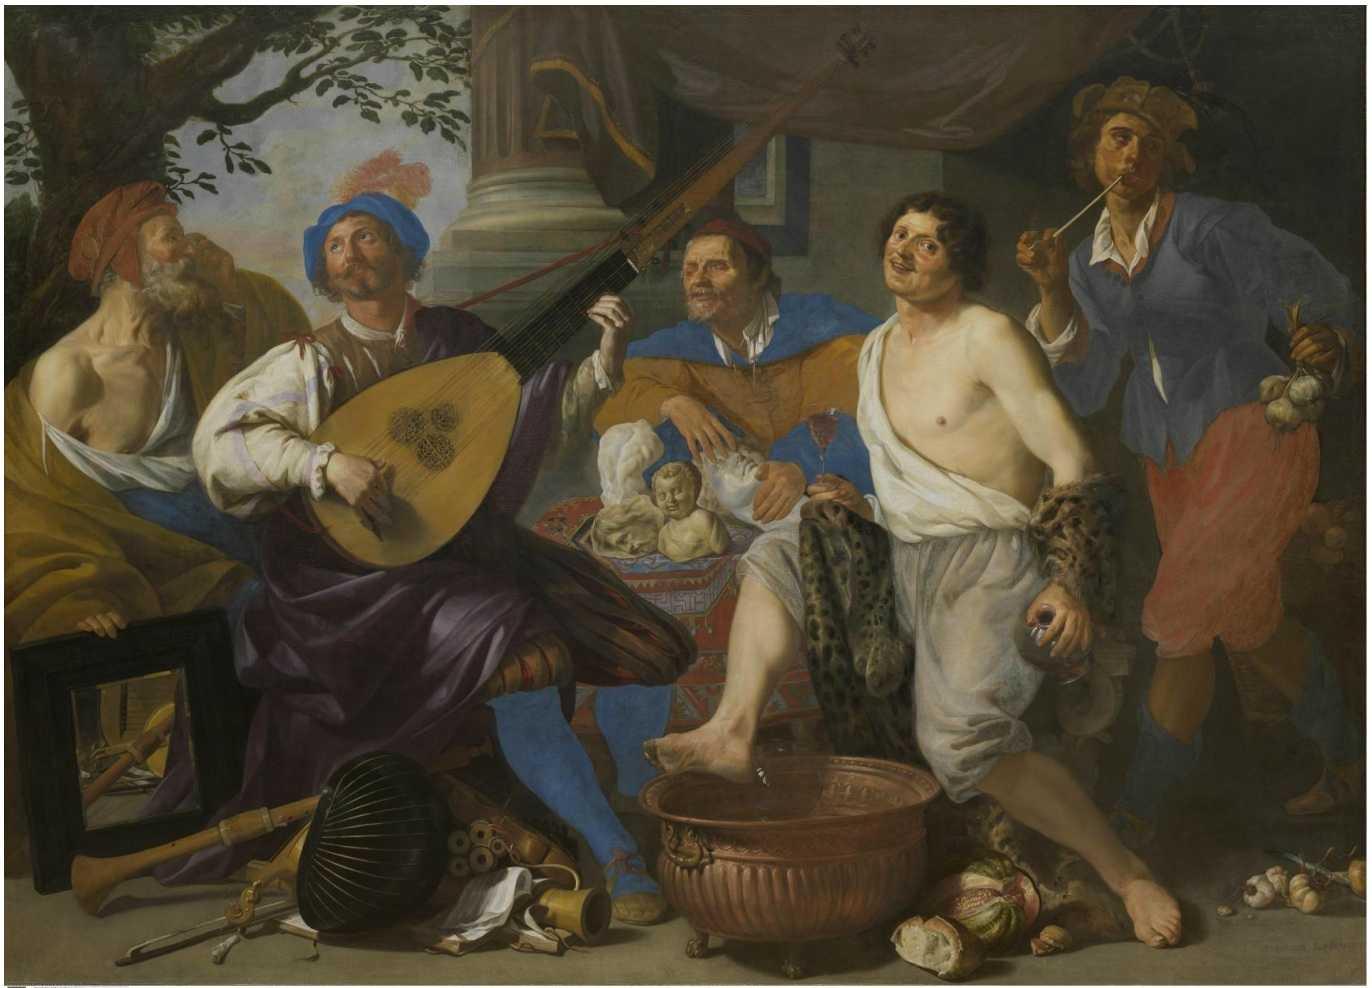 Theodoor Rombouts / Public domain